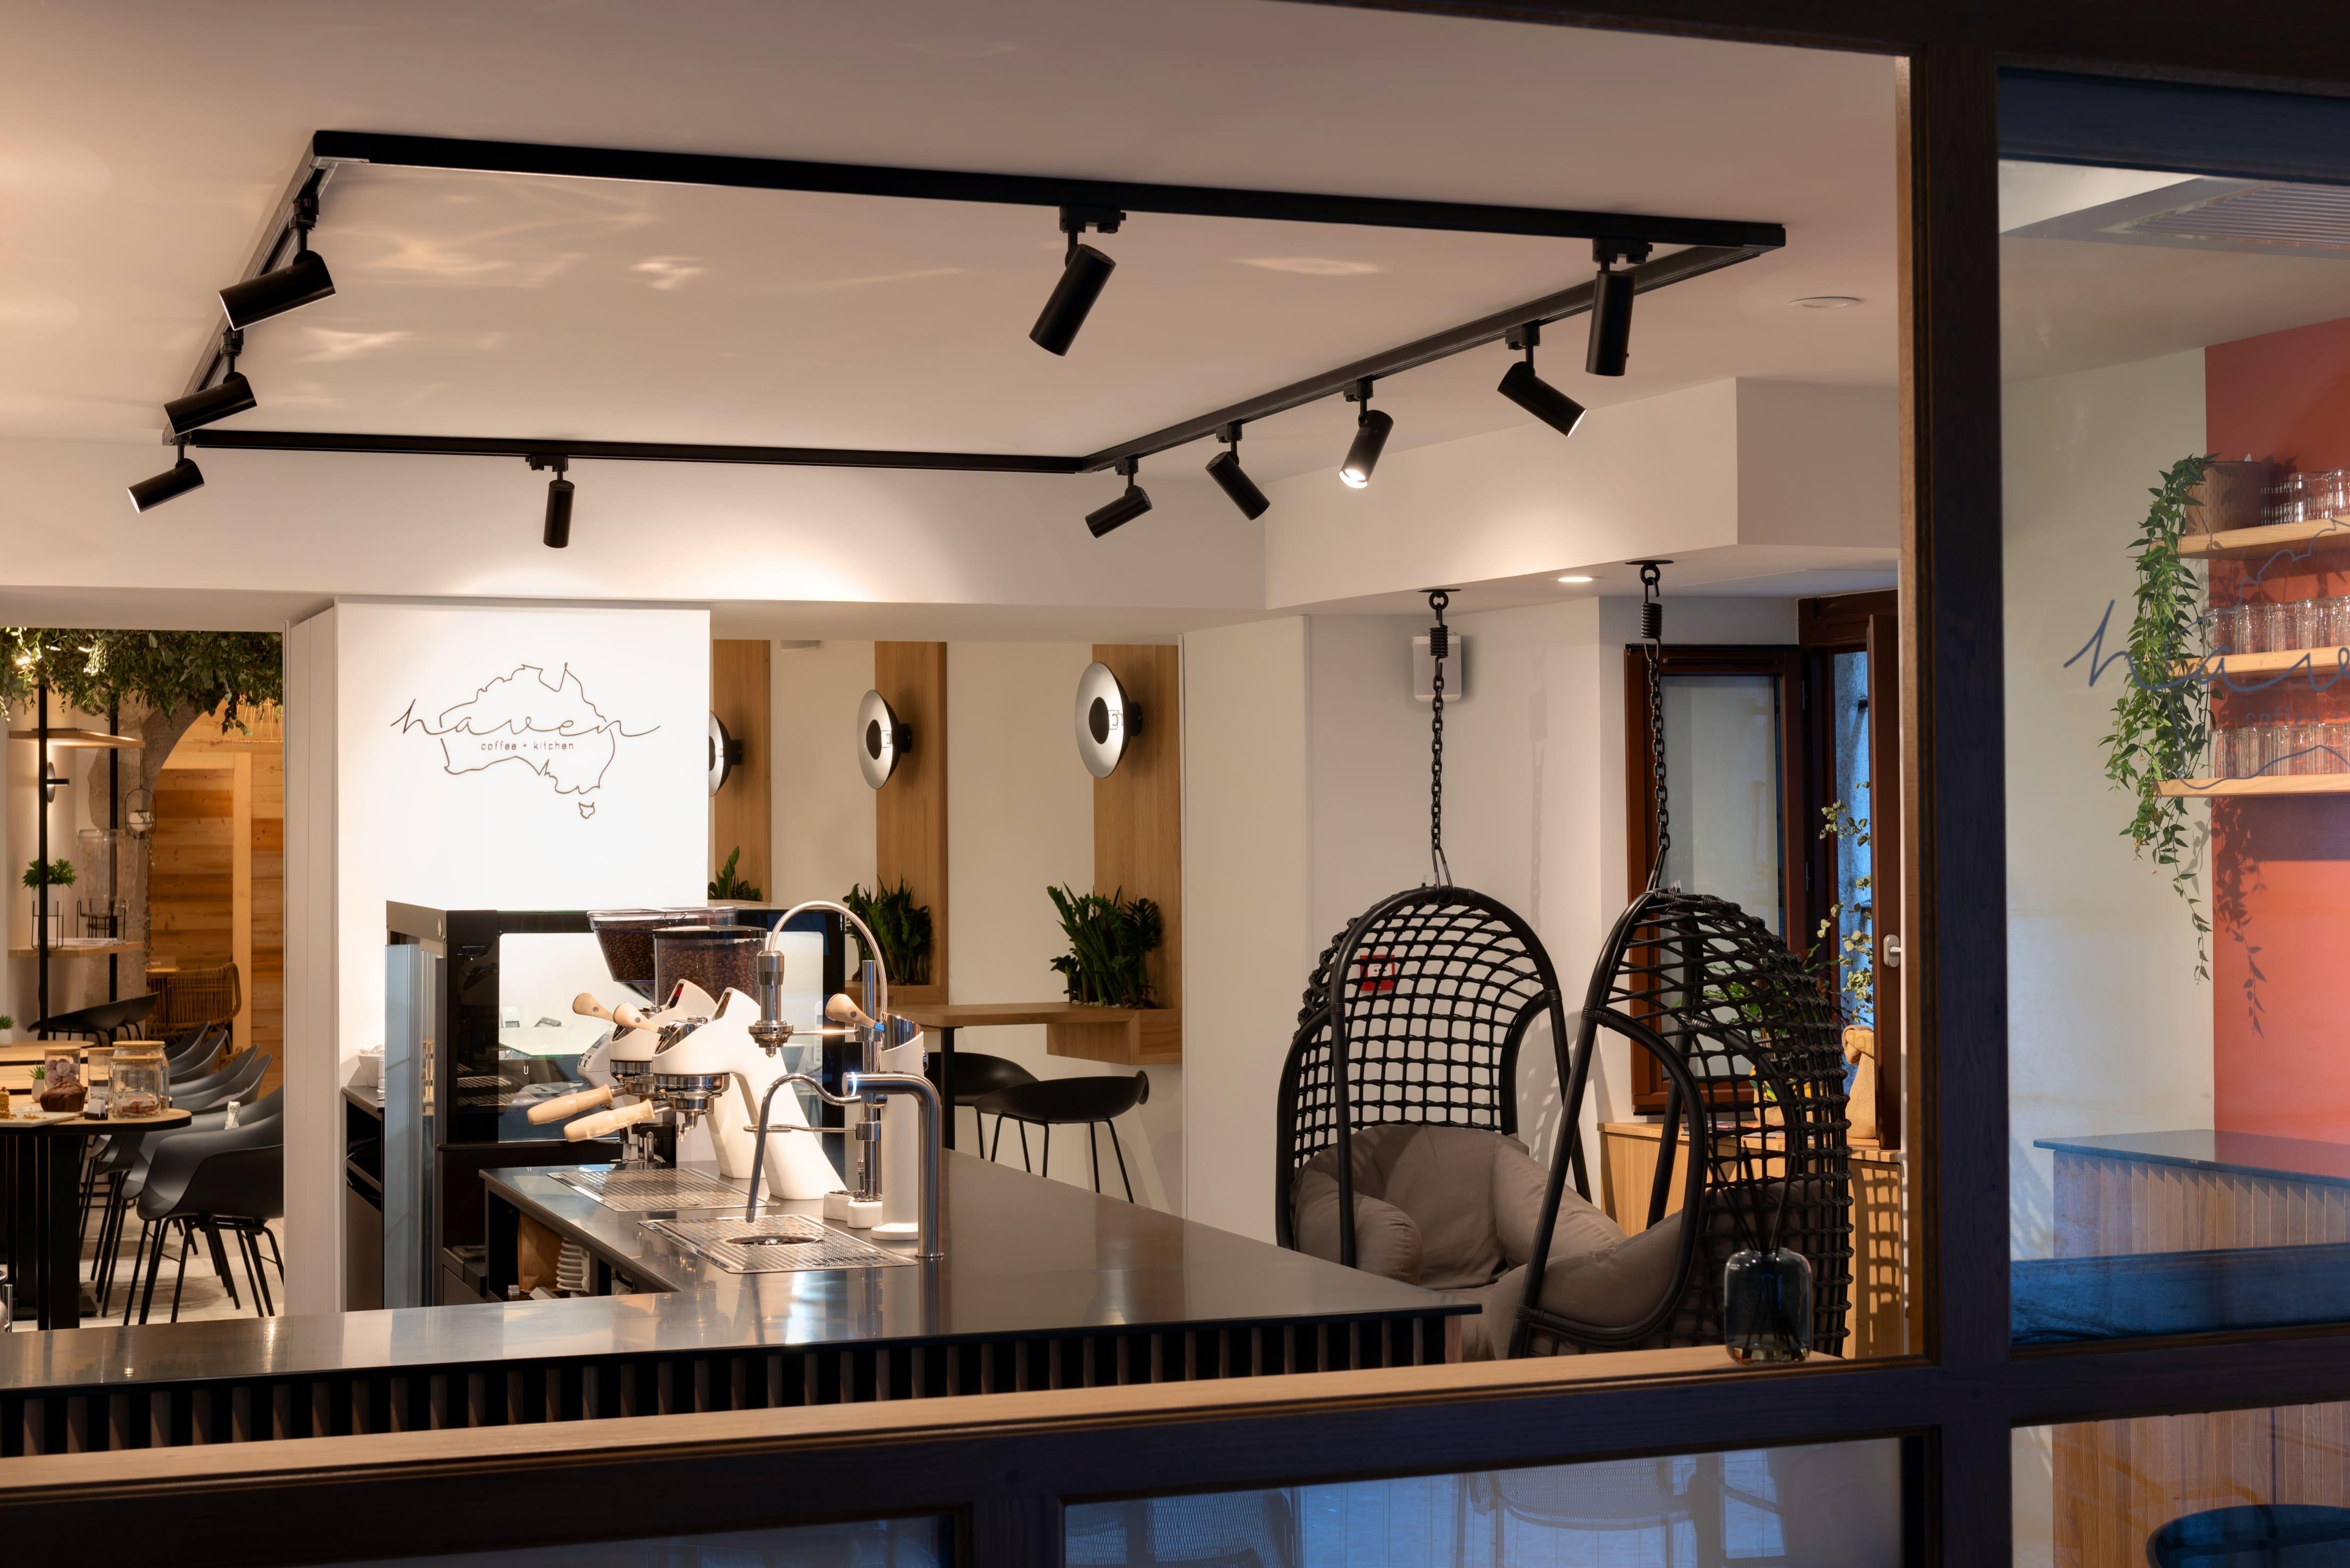 Agencement interieur design métallique ROBI restaurant Haven Annecy 74 agencement en metal 6